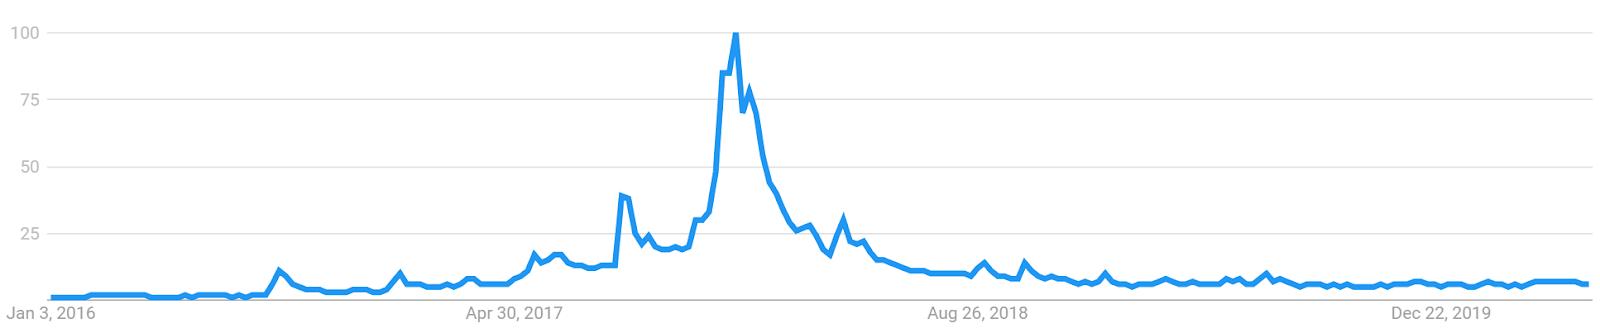 Monero Price Analysis 1 Jun 2020 (10)